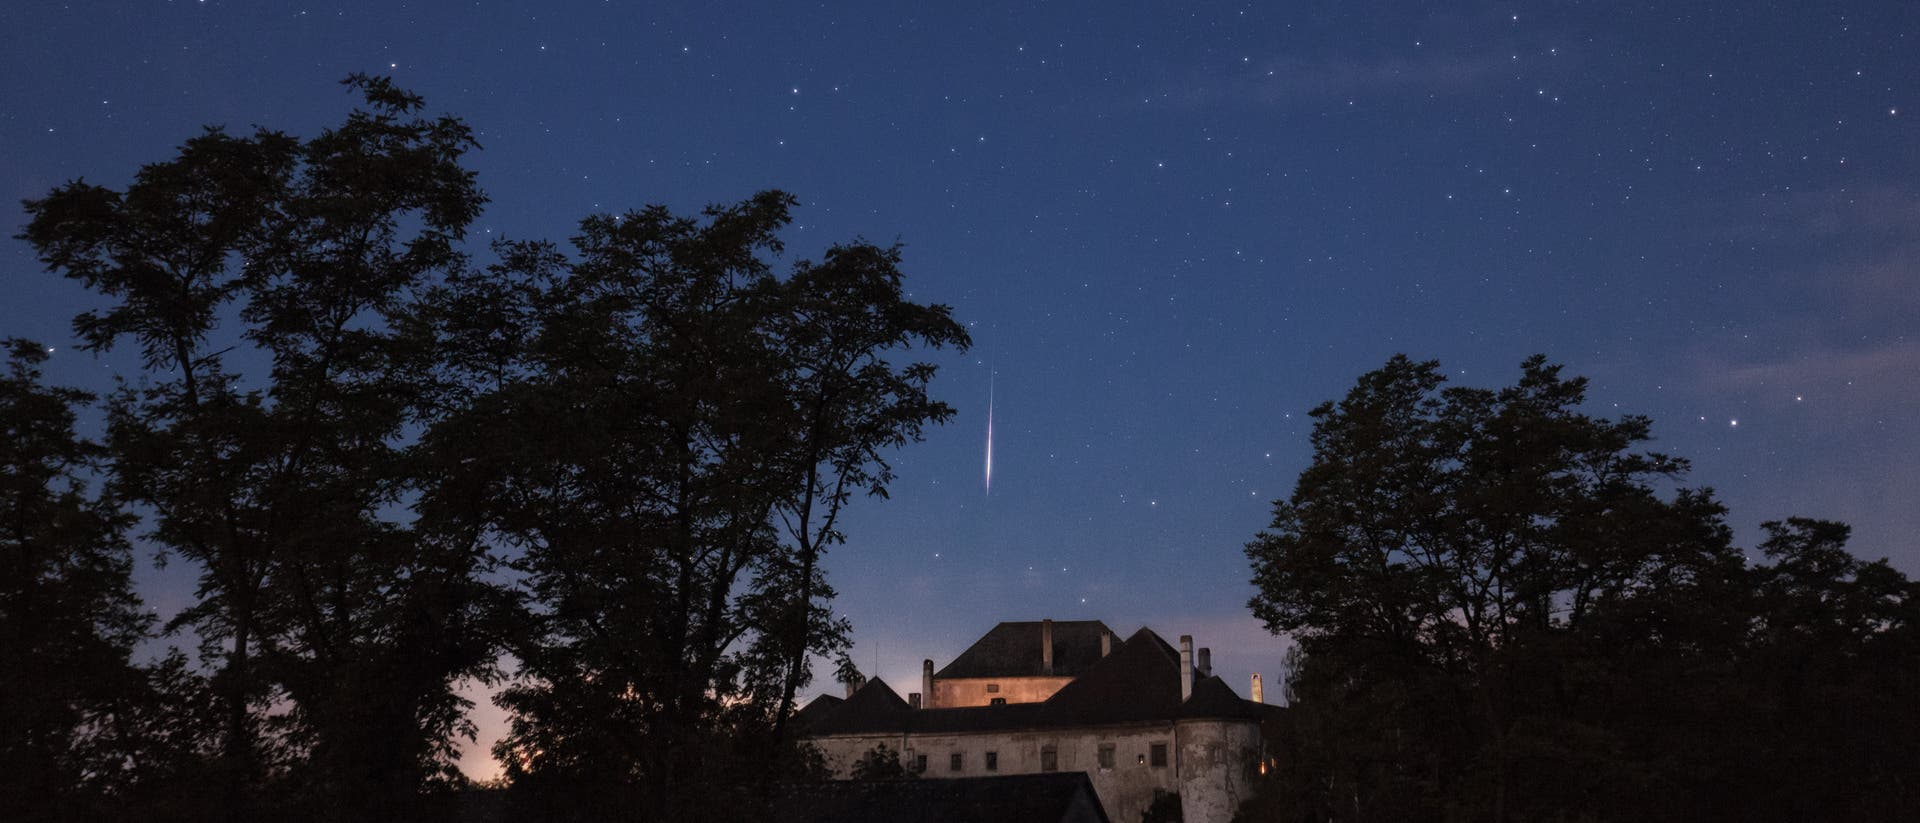 Perseiden-Meteor über Schloss Albrechtsberg